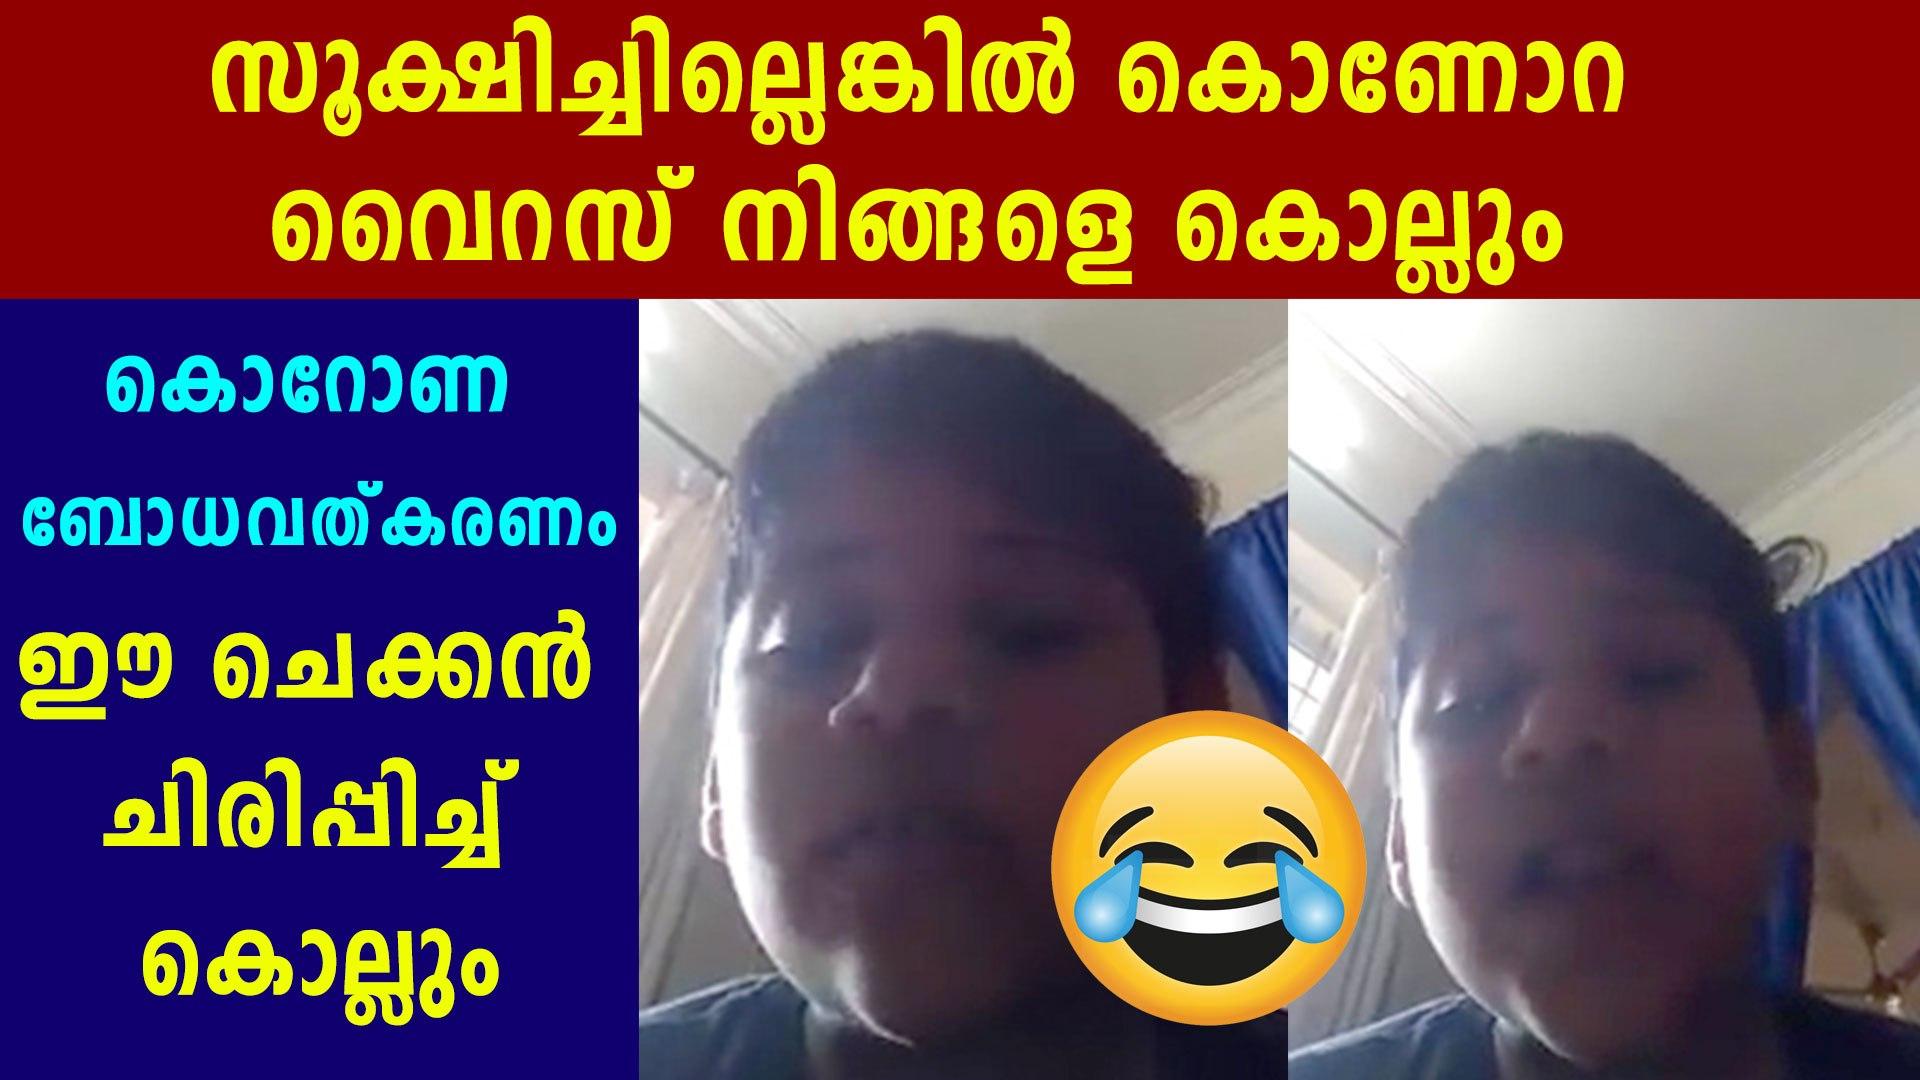 School Kid misspell corona virus as conora virus | Oneindia Malayalam